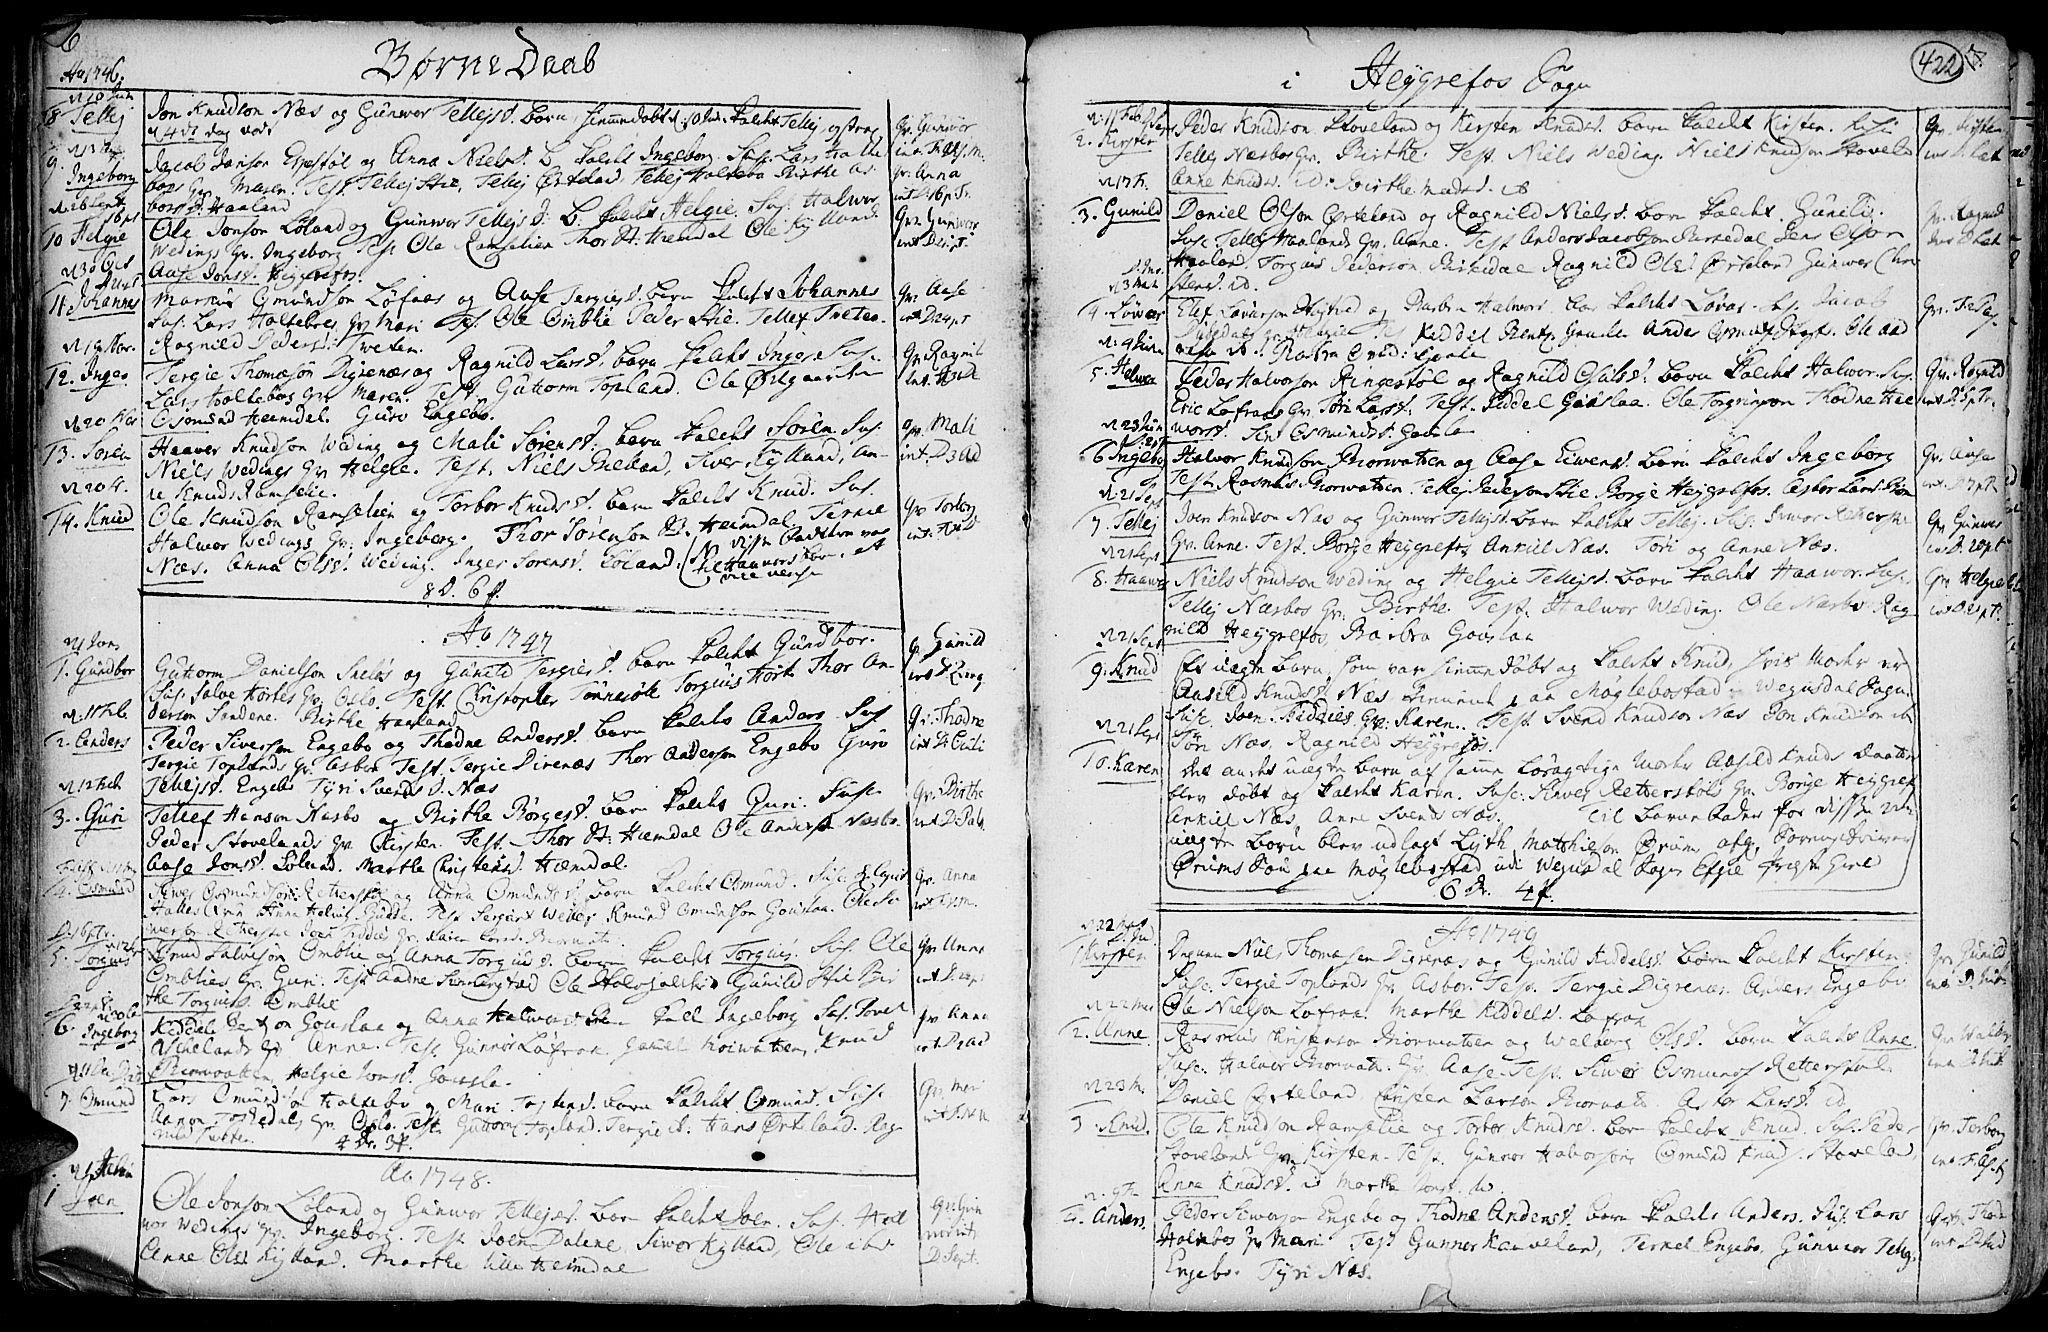 SAK, Hommedal sokneprestkontor, F/Fa/Fab/L0002: Ministerialbok nr. A 2 /3, 1740-1821, s. 422